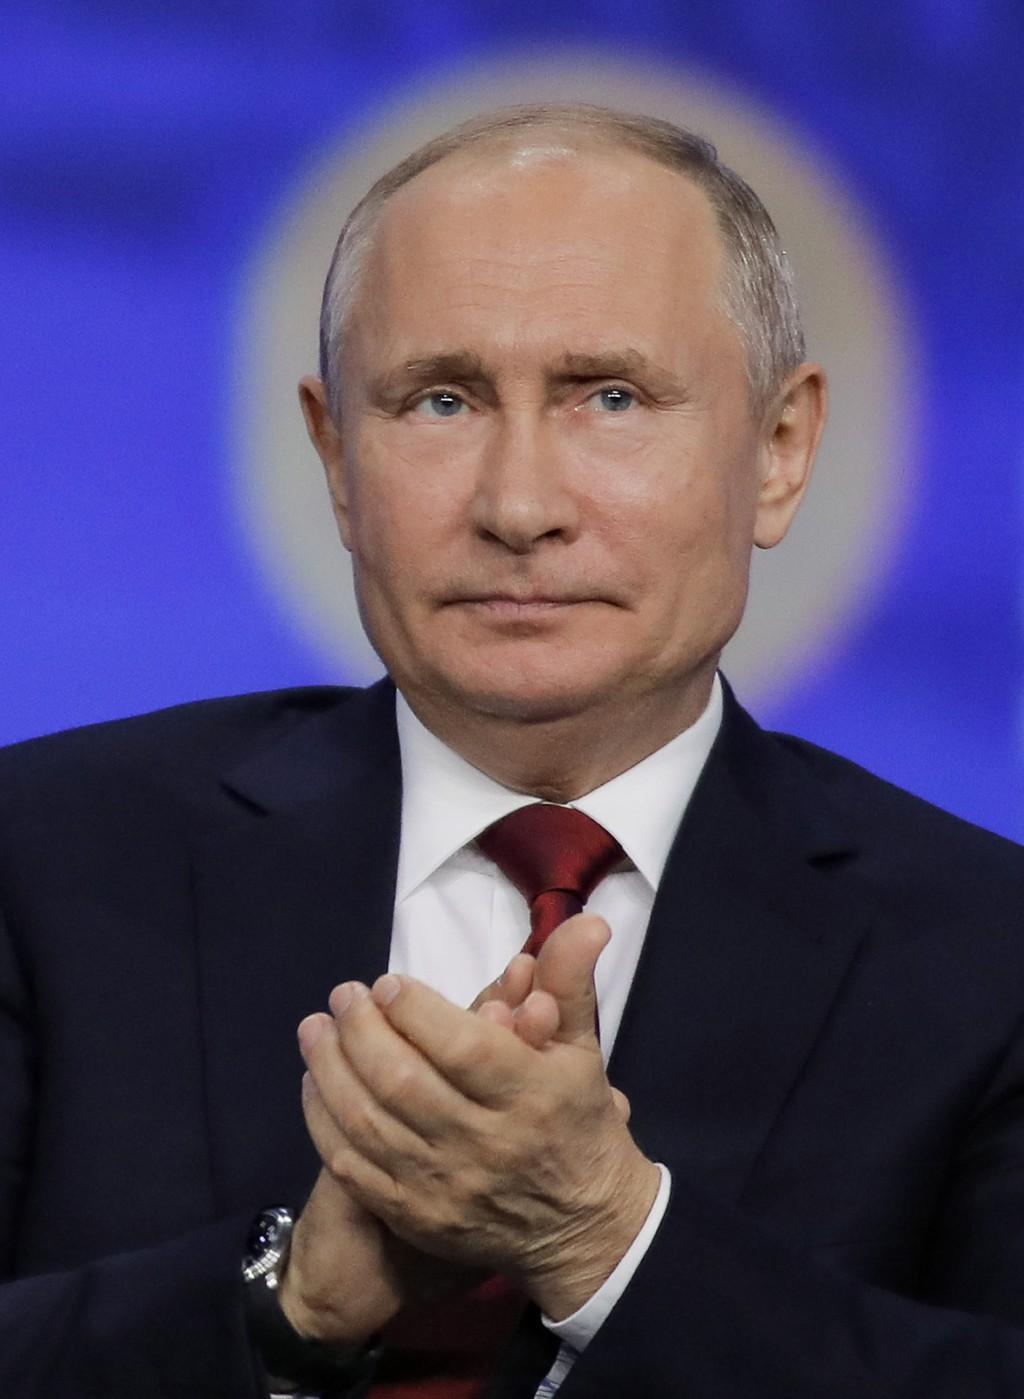 Russian President Vladimir Putin attends the St. Petersburg International Economic Forum in St. Petersburg, Russia, Friday, June 7, 2019. (AP Photo/Dm